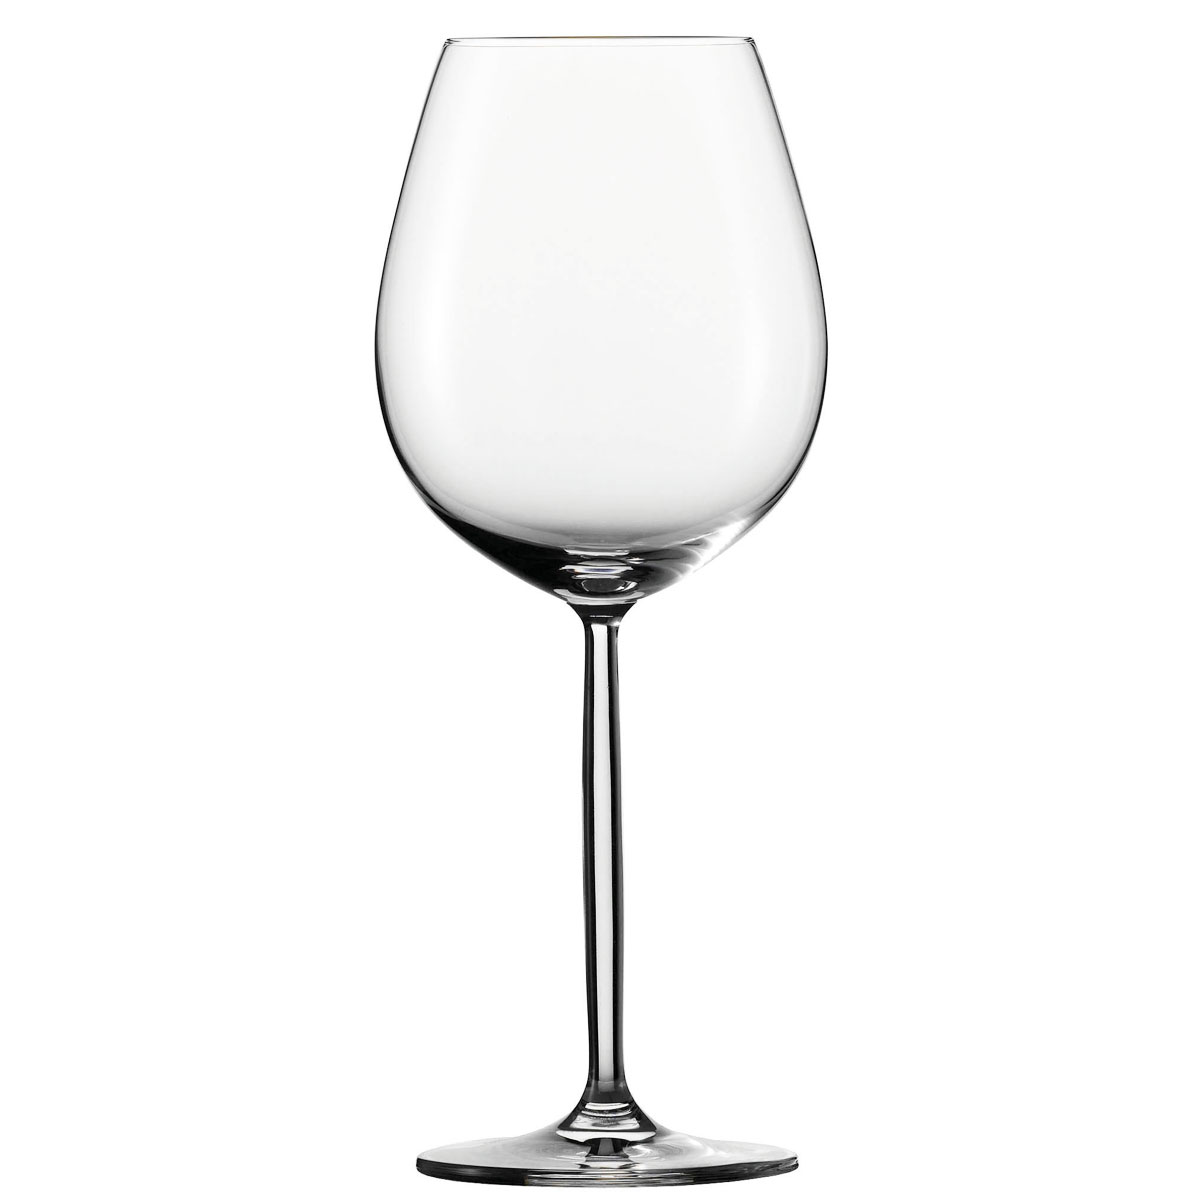 Schott Zwiesel Tritan Crystal, Diva Crystal Wine and Water Crystal Goblet, Single